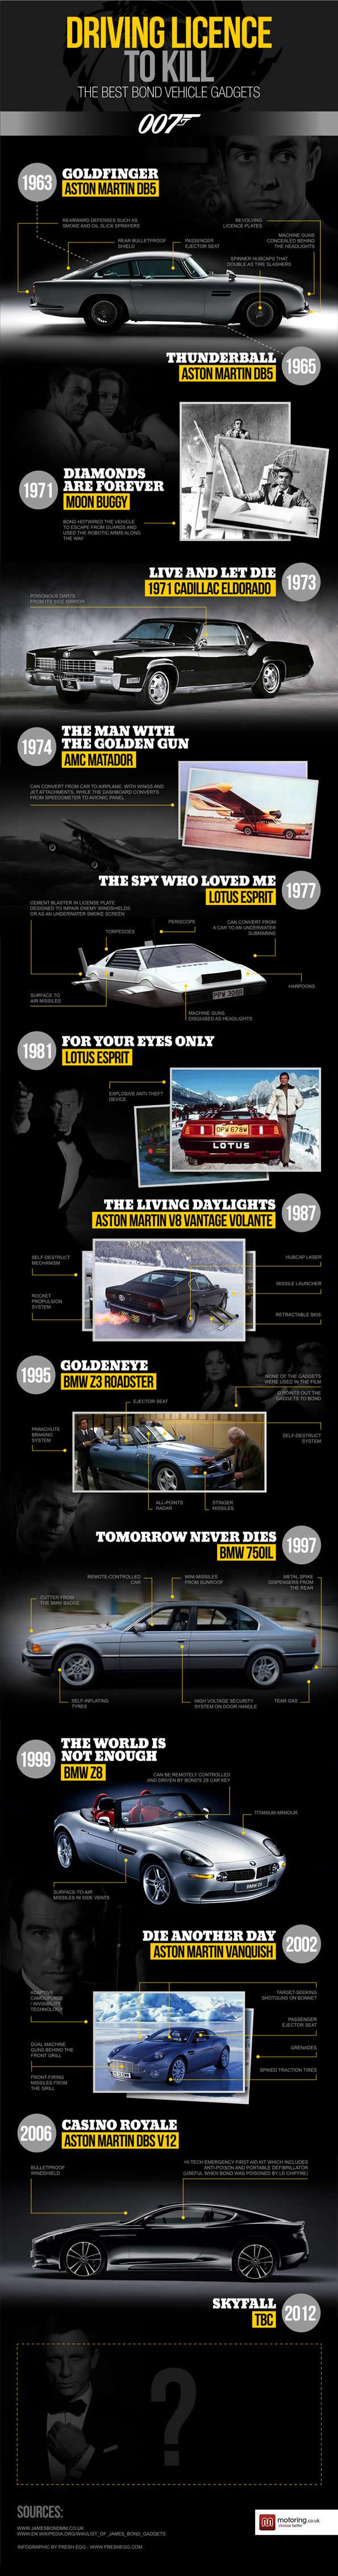 8. James Bond Cars